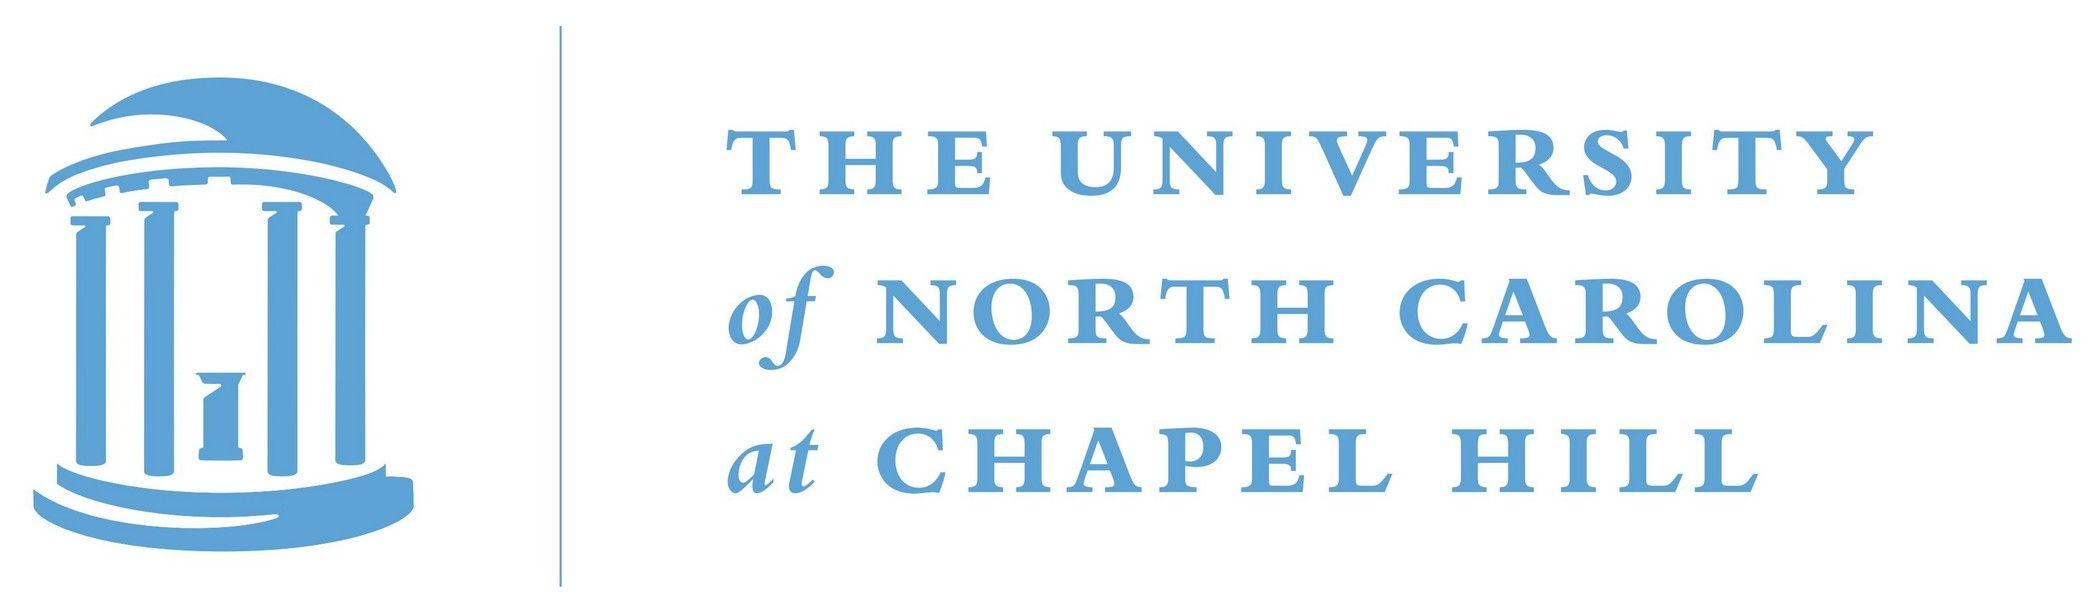 Unc Logo And Seals University Of North Carolina At Chapel Hill University Of North Carolina Unc Logo University Logo